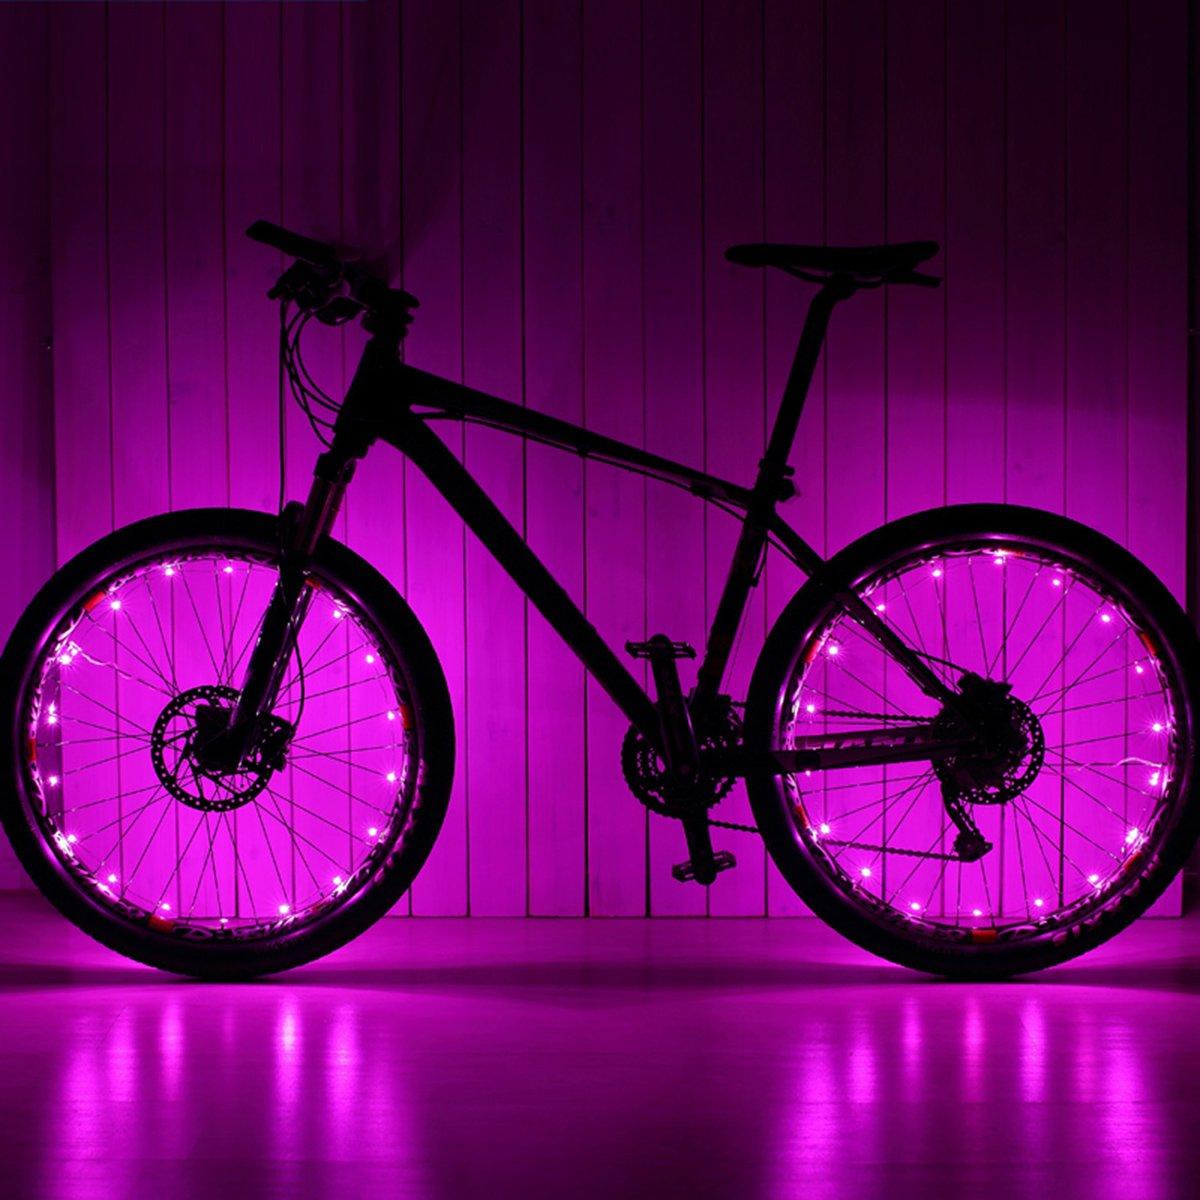 VORCOOL LED Bike Wheel Lights, Super Cool Lights Brilliant Bicycle Wheel Light String,USB Rechargeable Battery (1 Tire Pack)